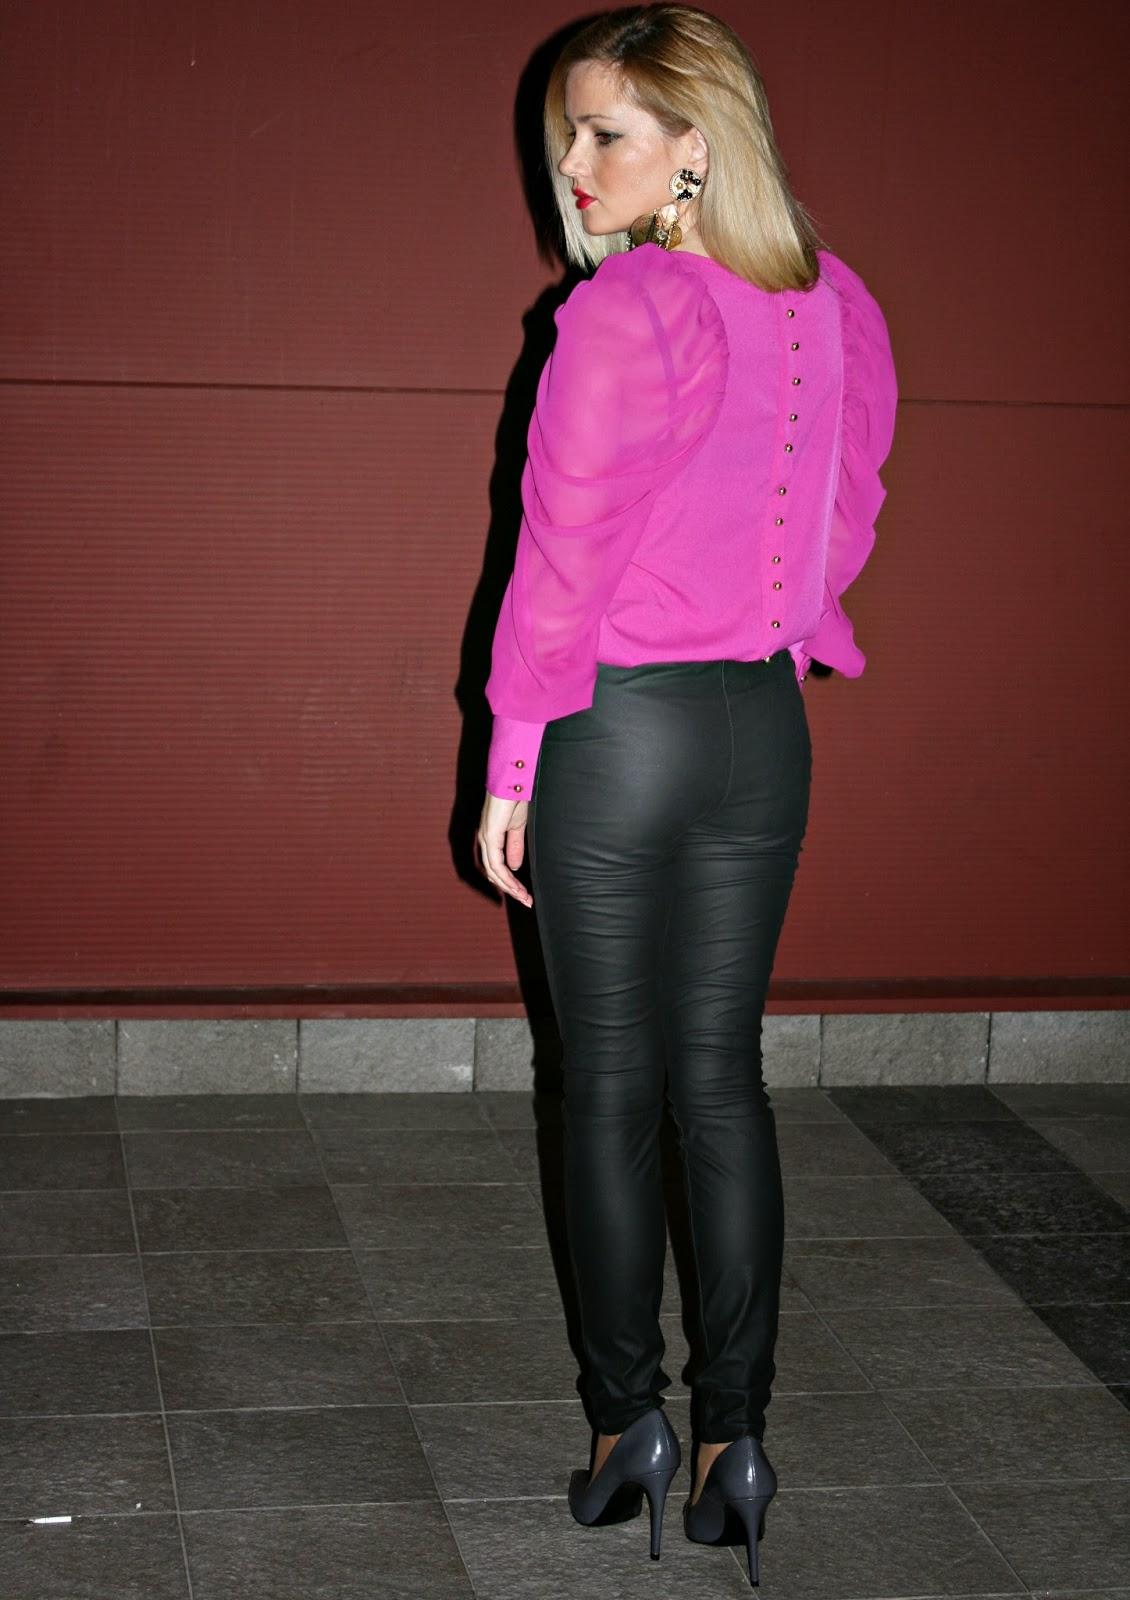 Posh Designer Fashion